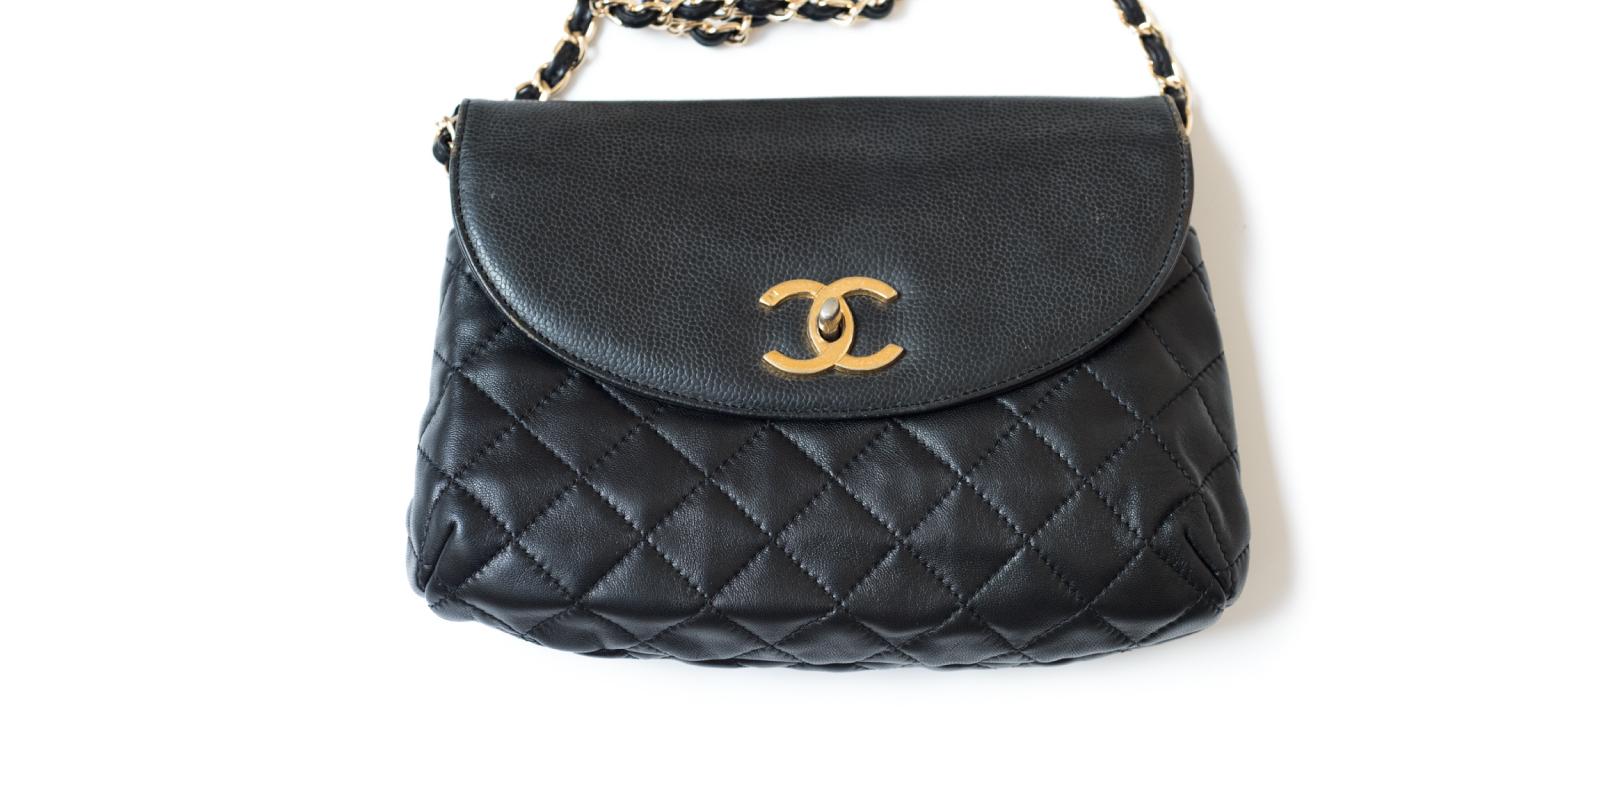 Chanel 包包一分为二.移植与混搭